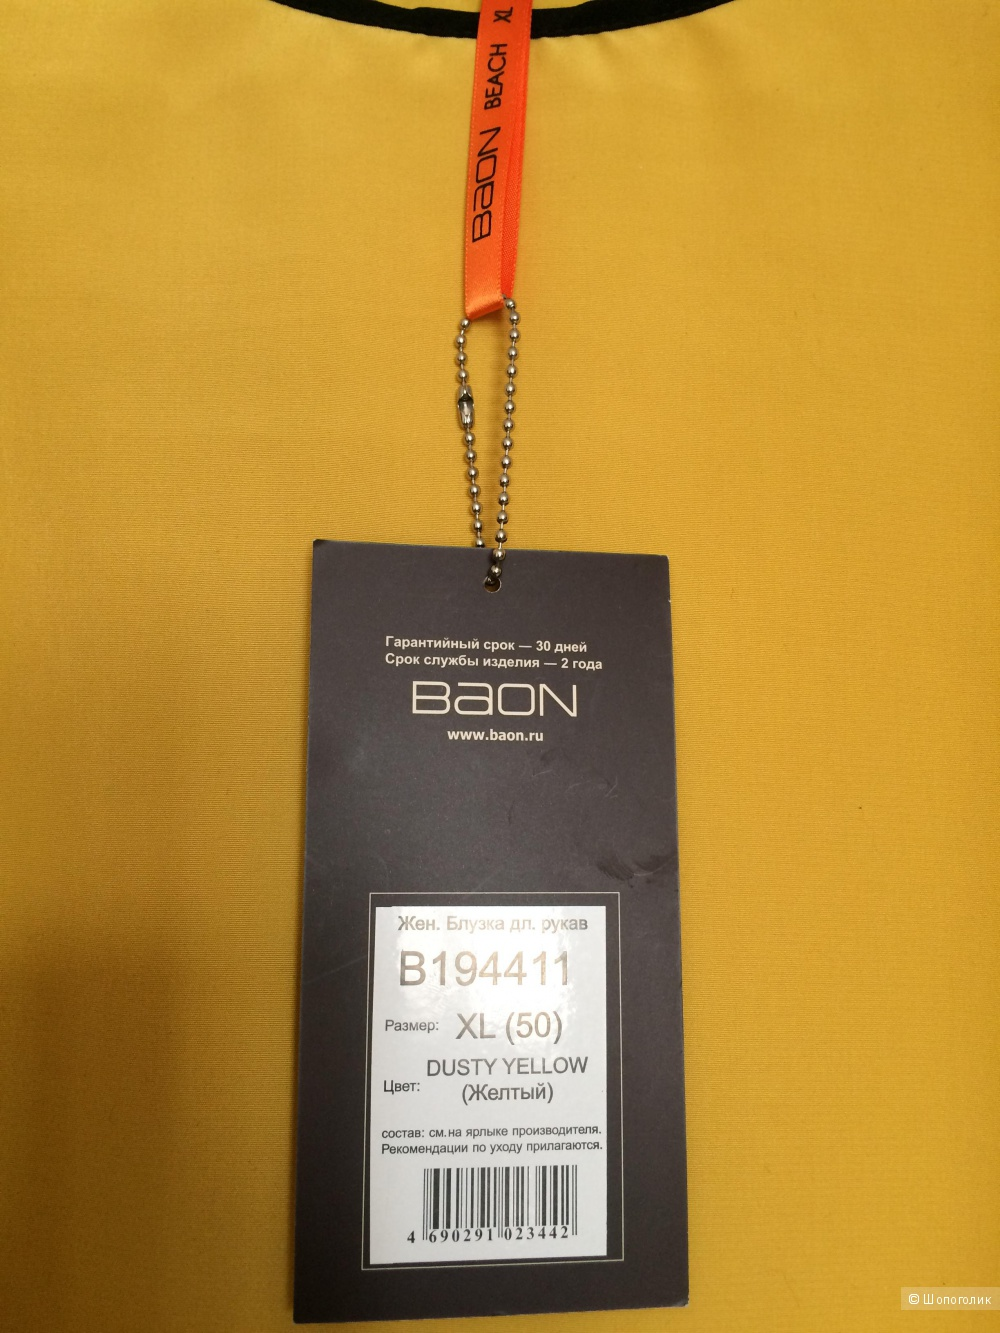 Топ BAON размер XL/50